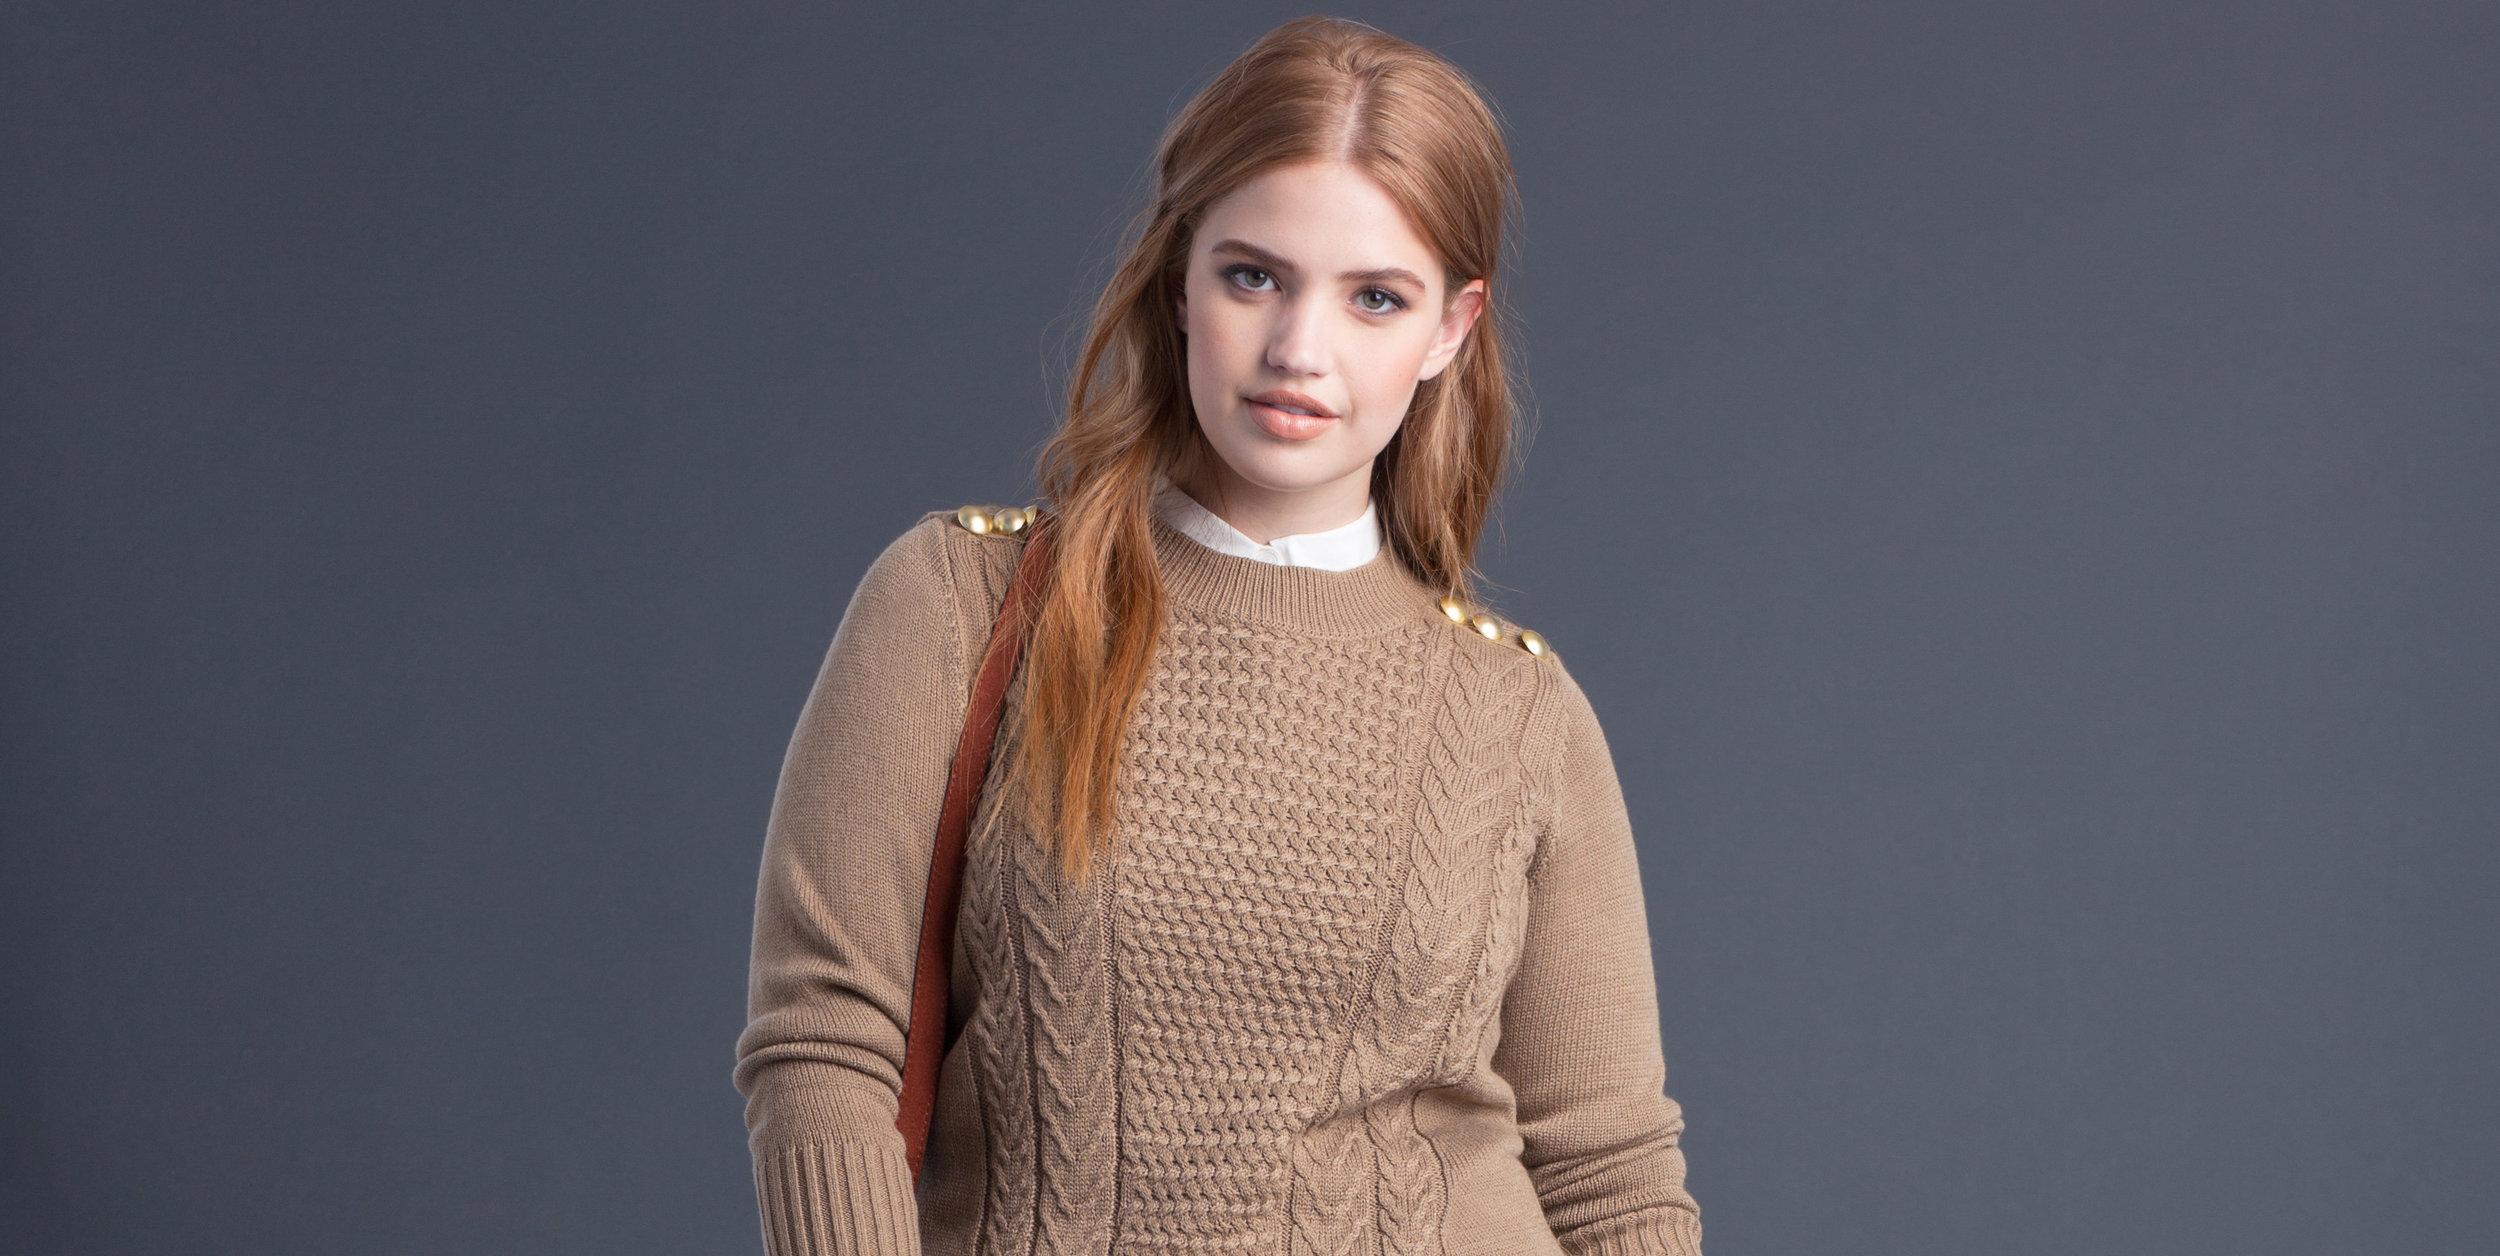 wear-it-later-leather-skirt_892-1-e1474033192231.jpg